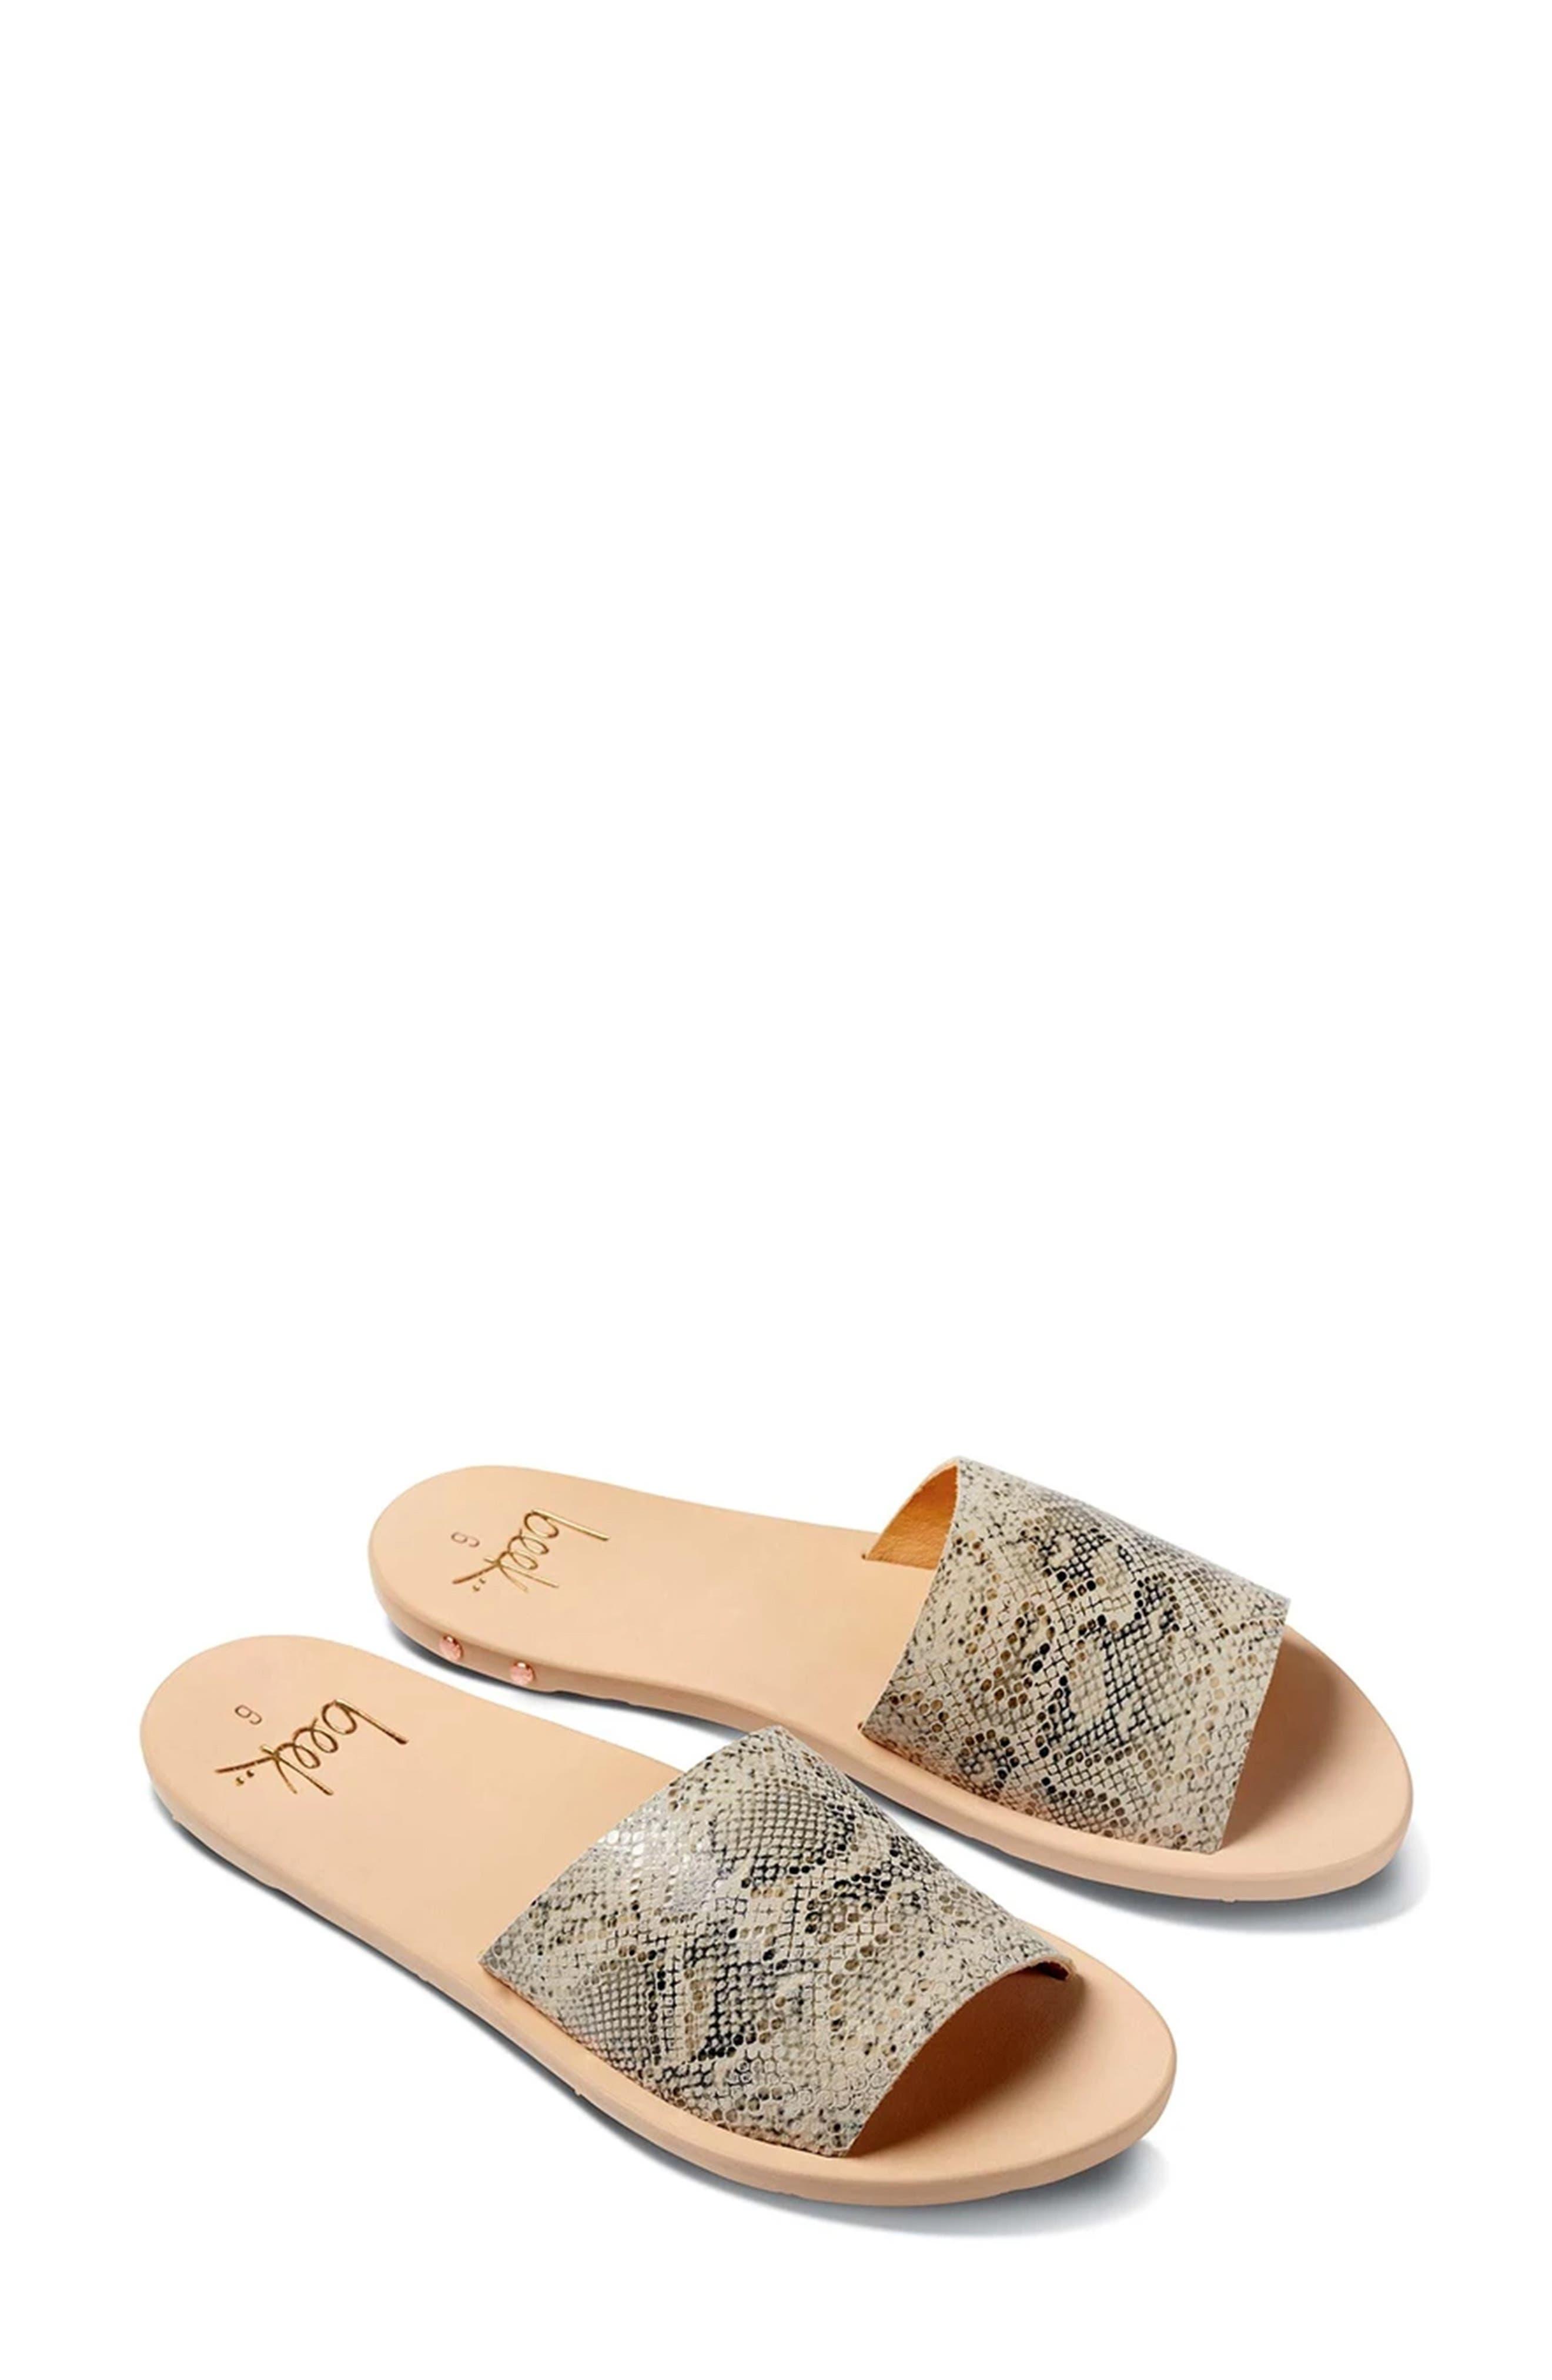 Mockingbird Slide Sandal